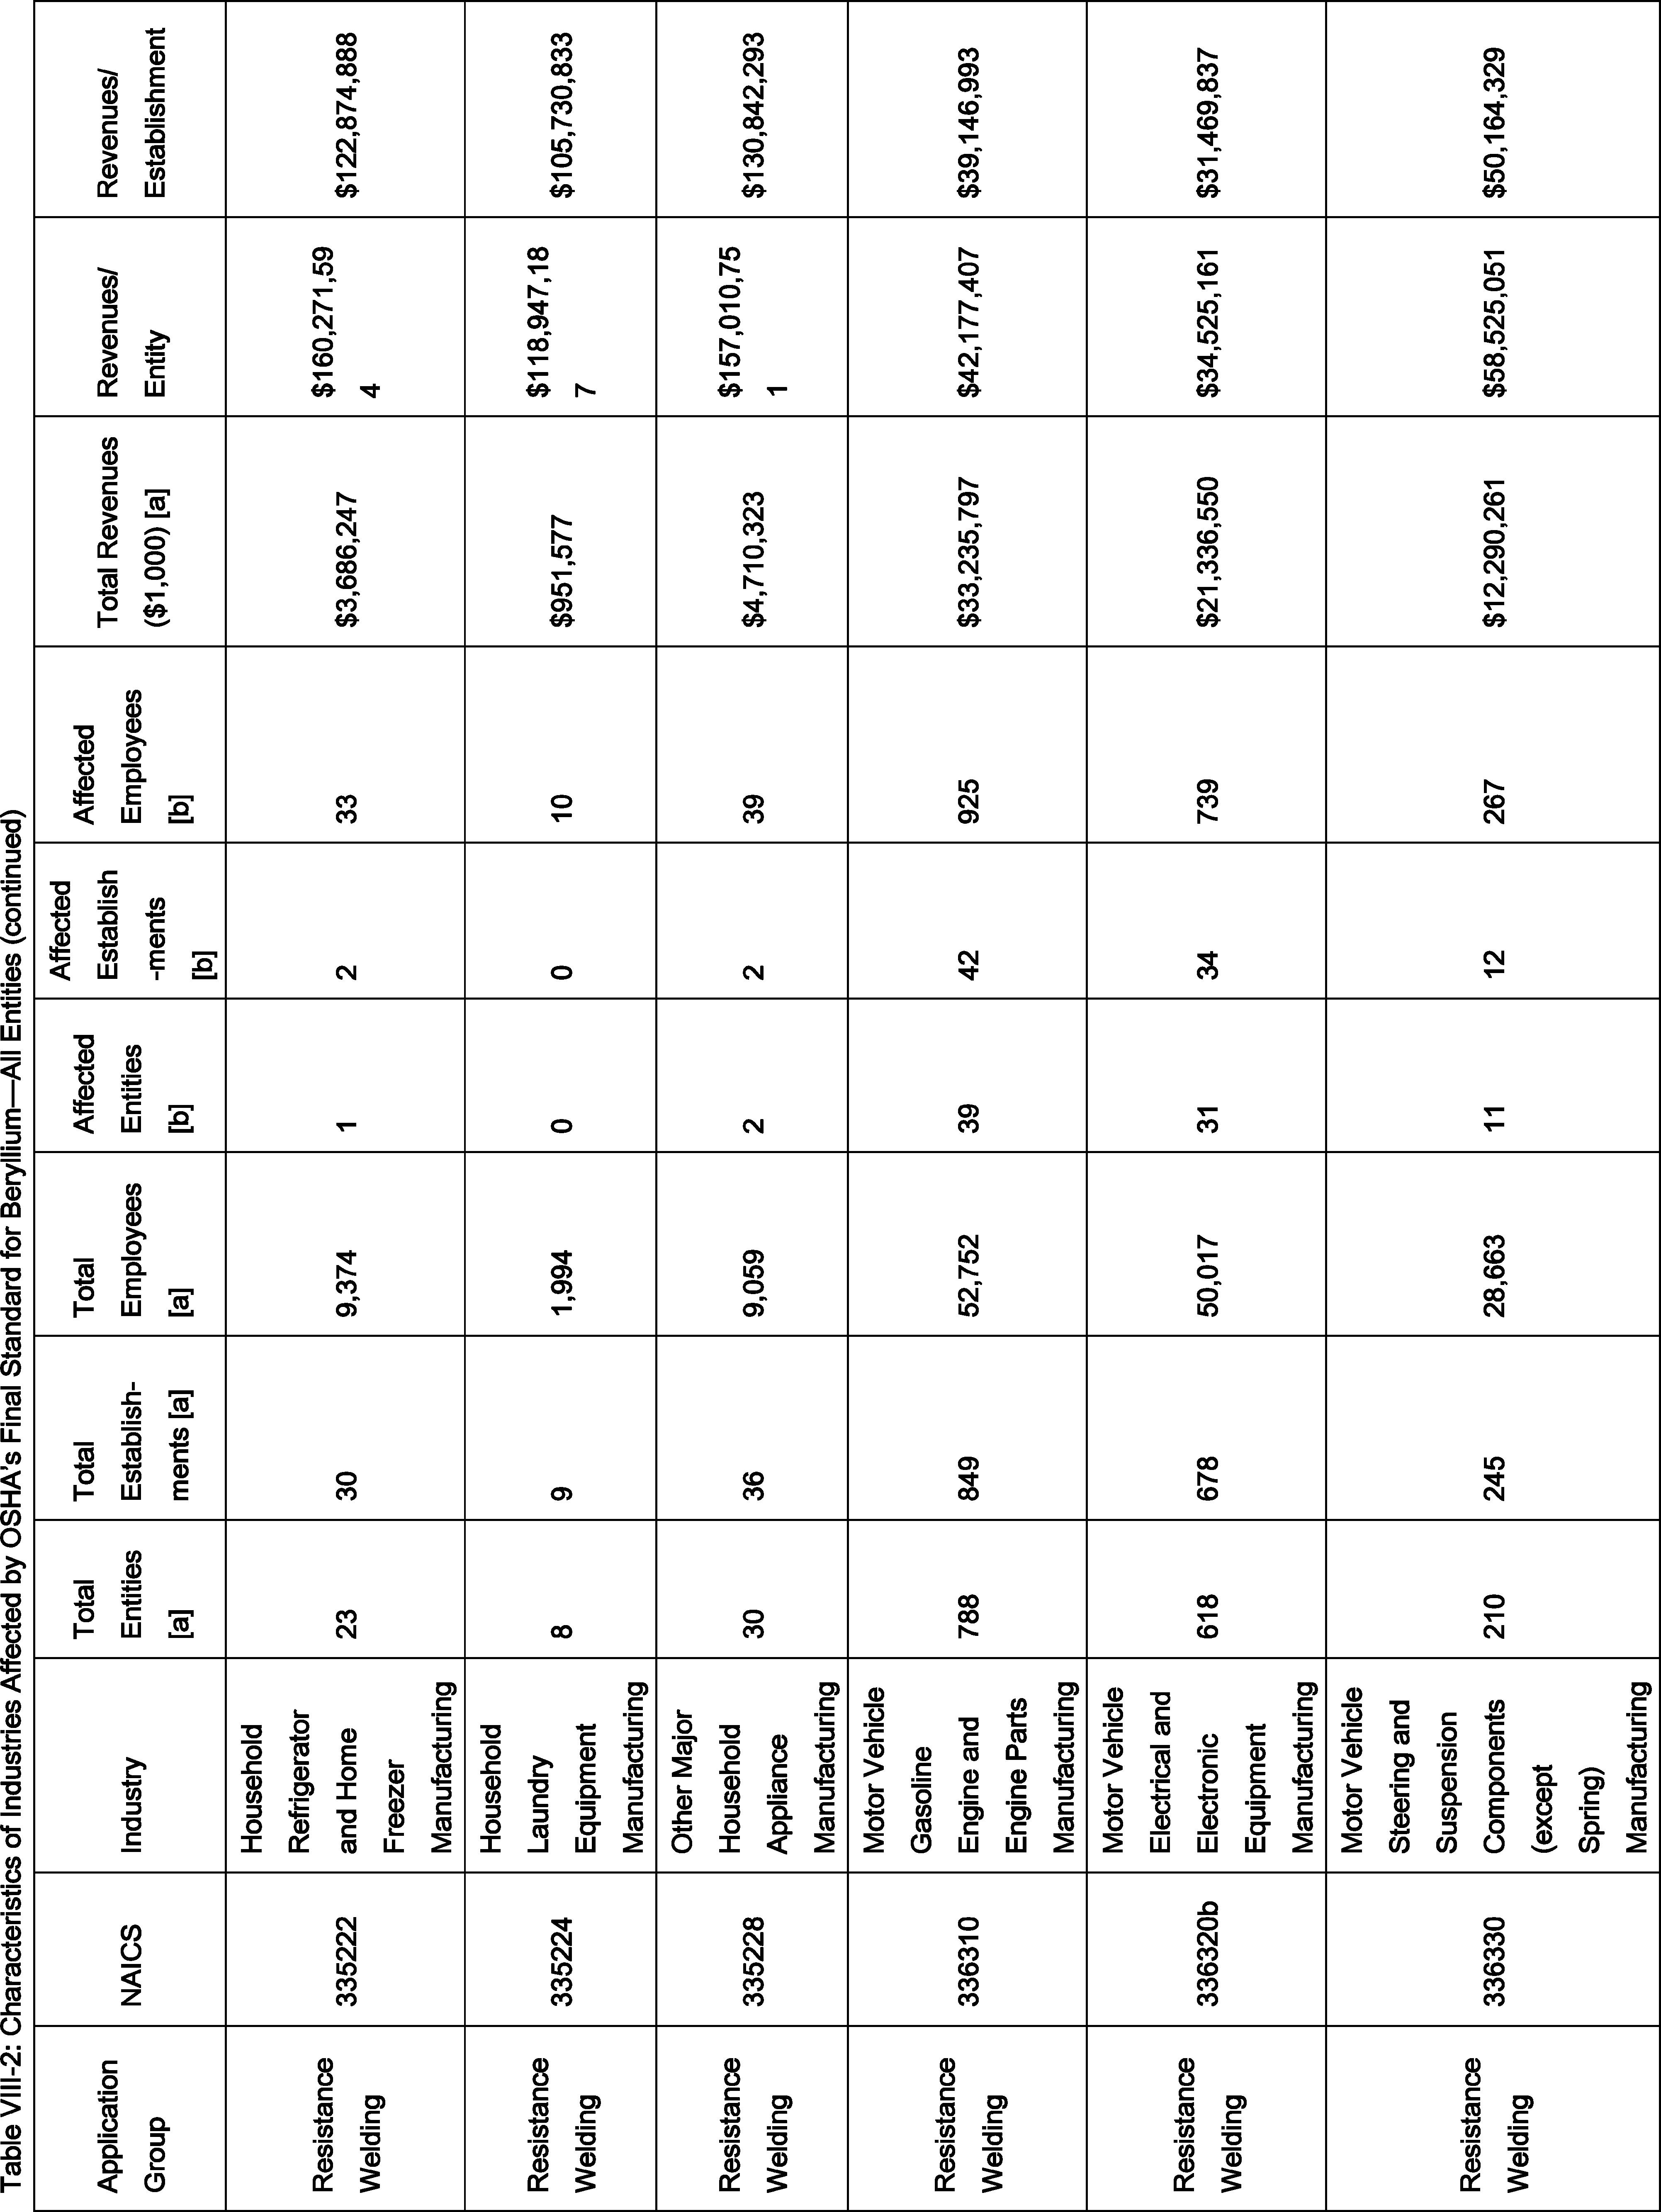 Federal Register Occupational Exposure to Beryllium